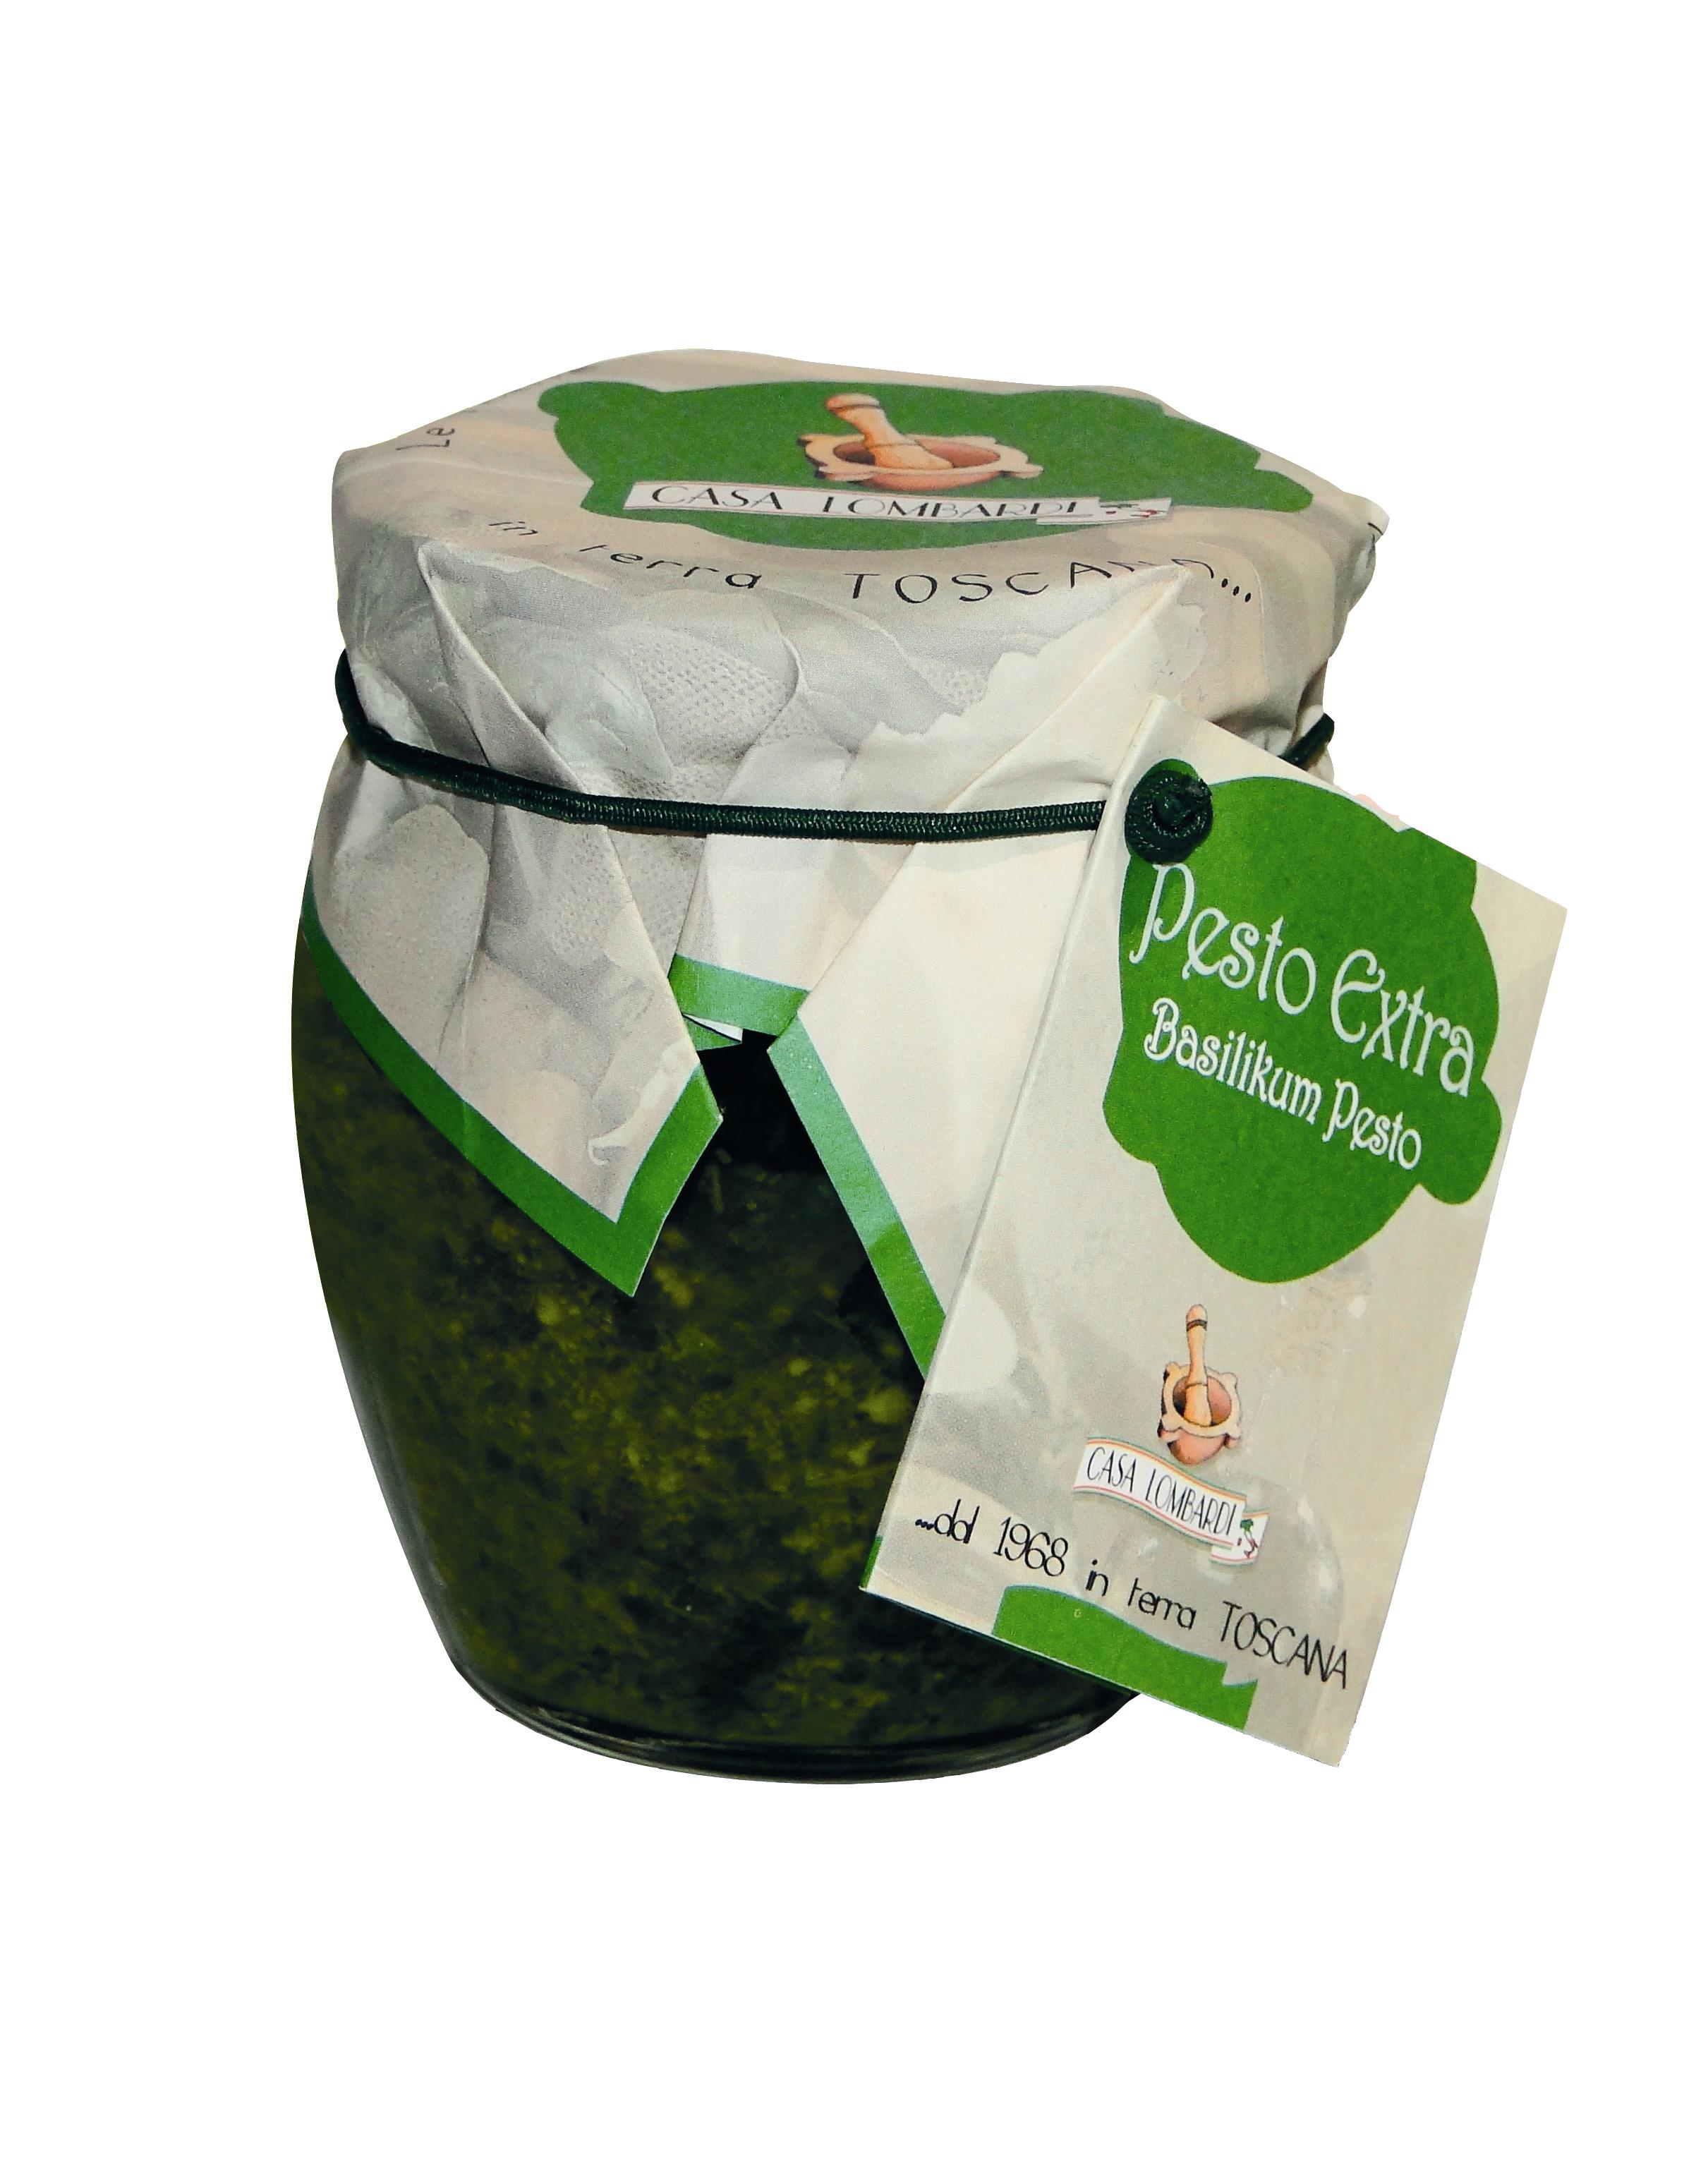 Crema Lombardi Pesto Extra 170g